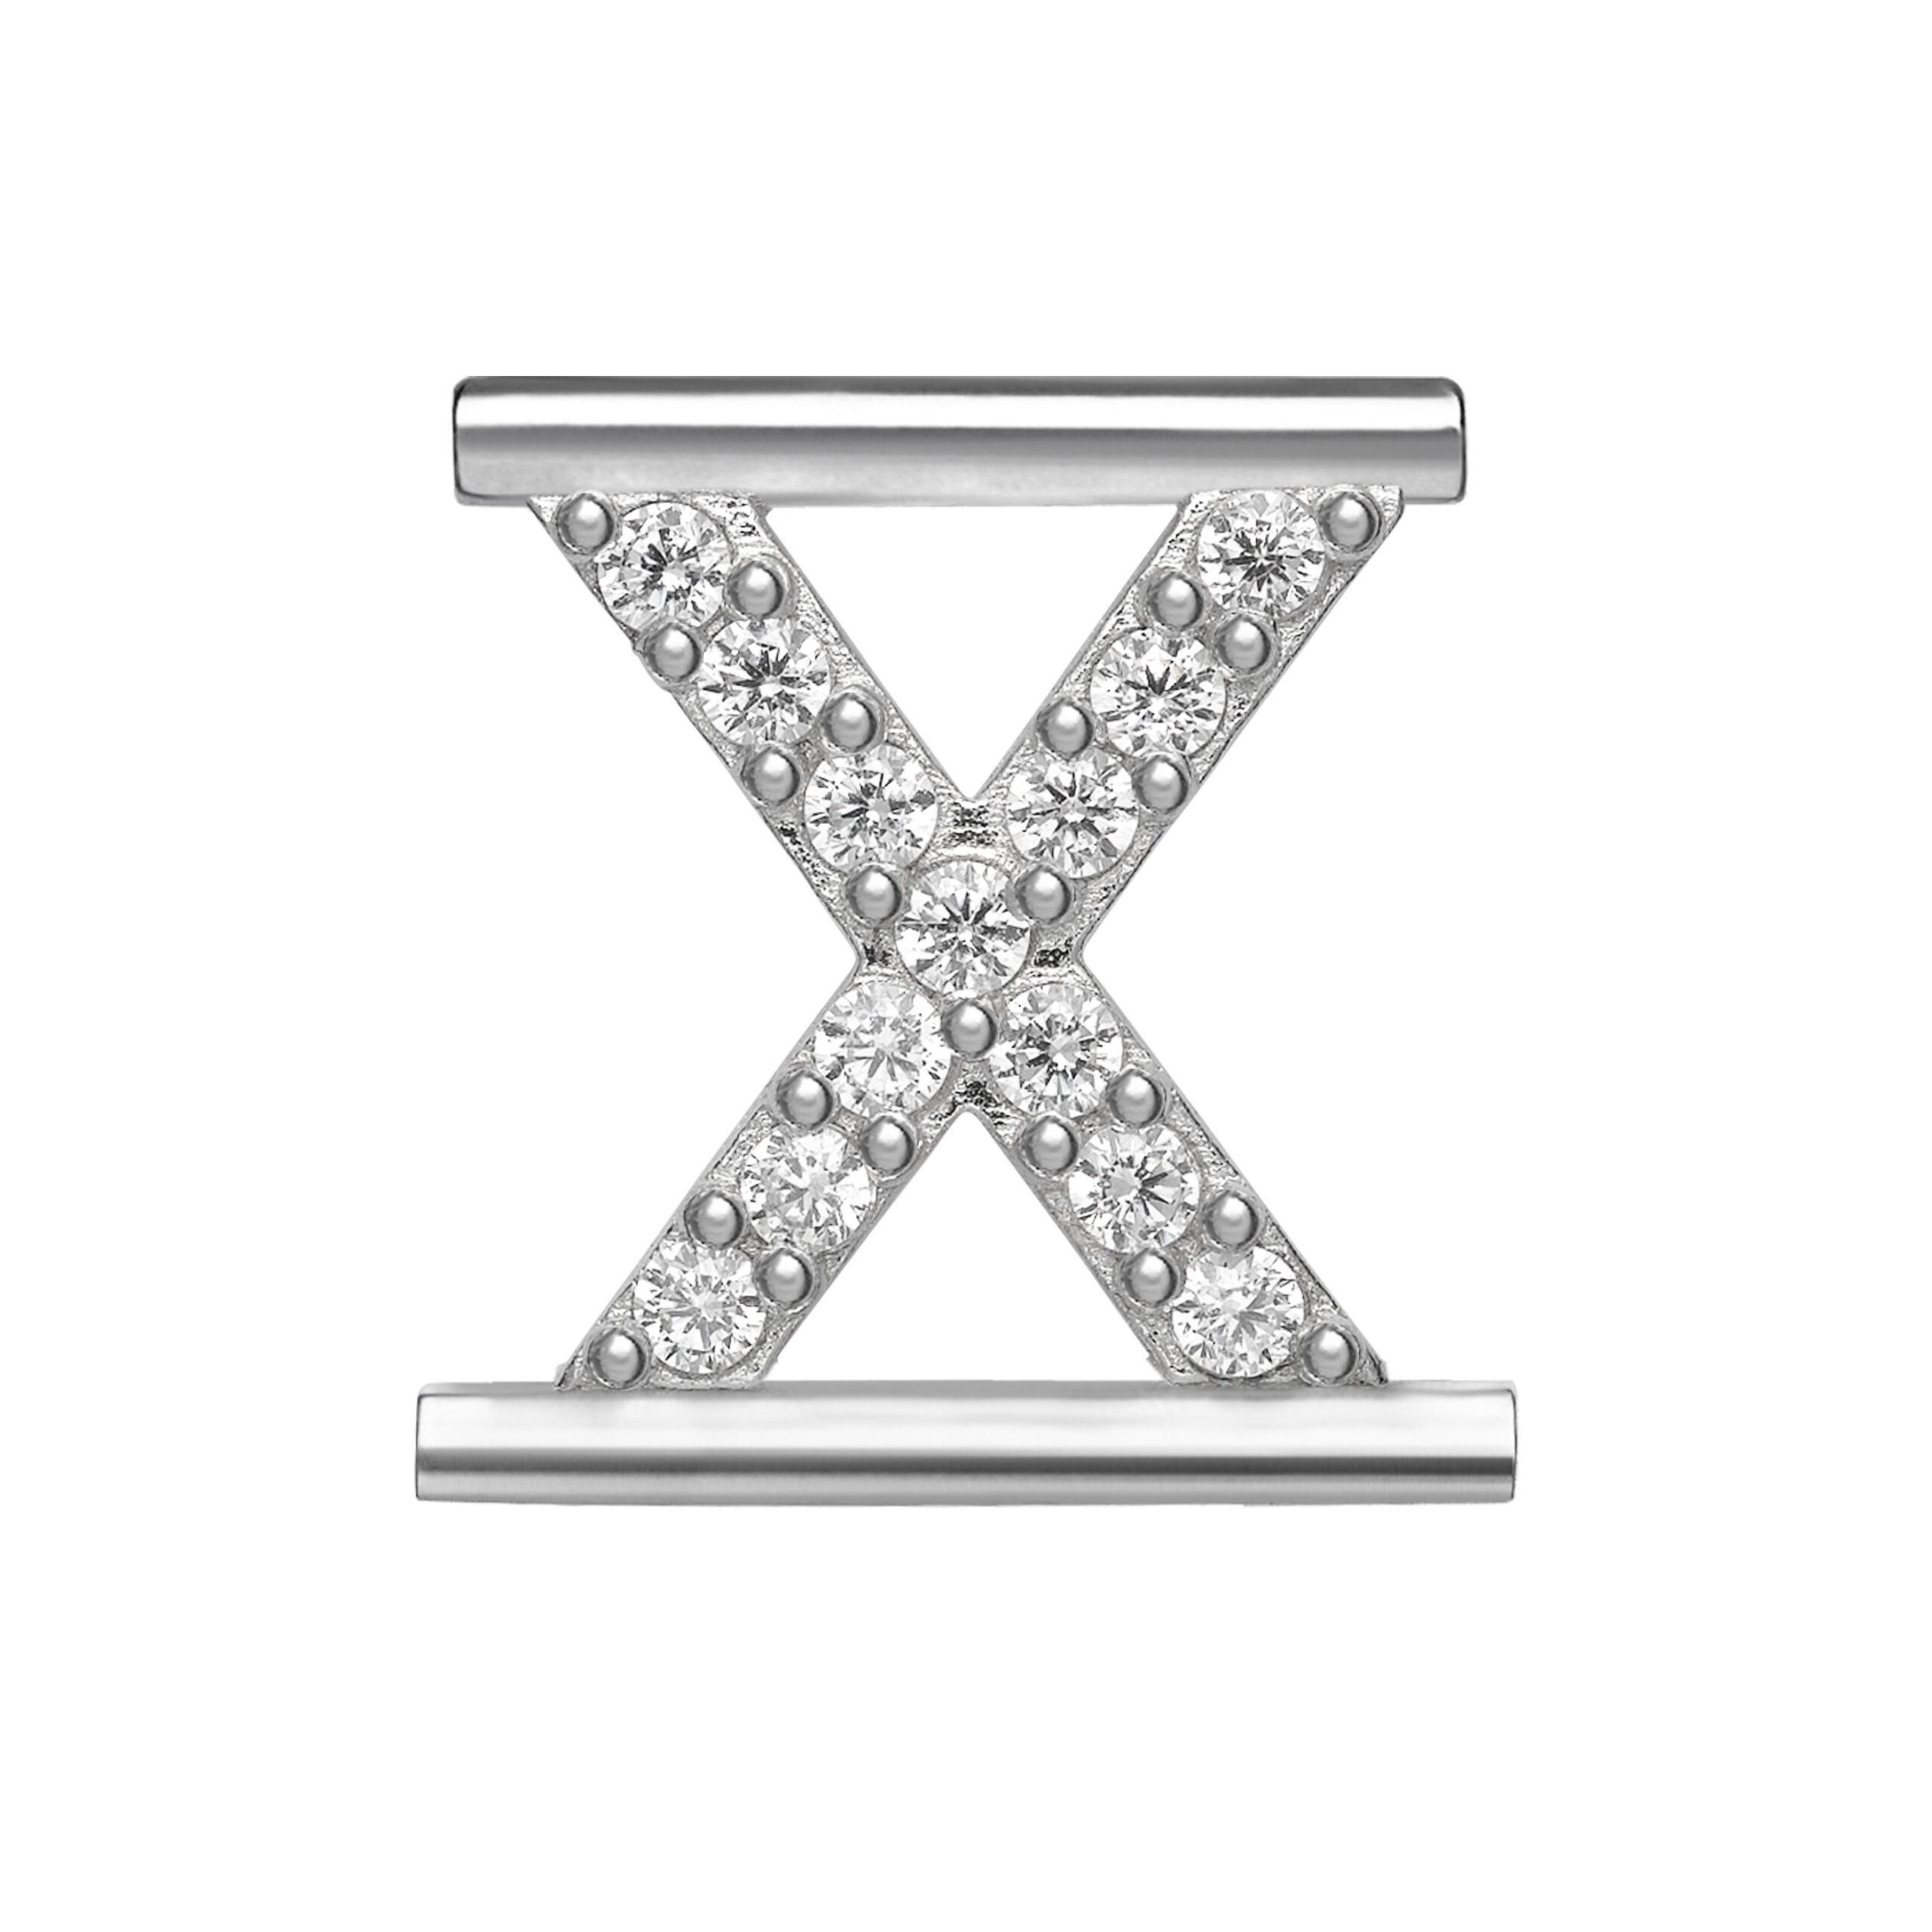 ELEONORA GIORDANI Argento Elementi X